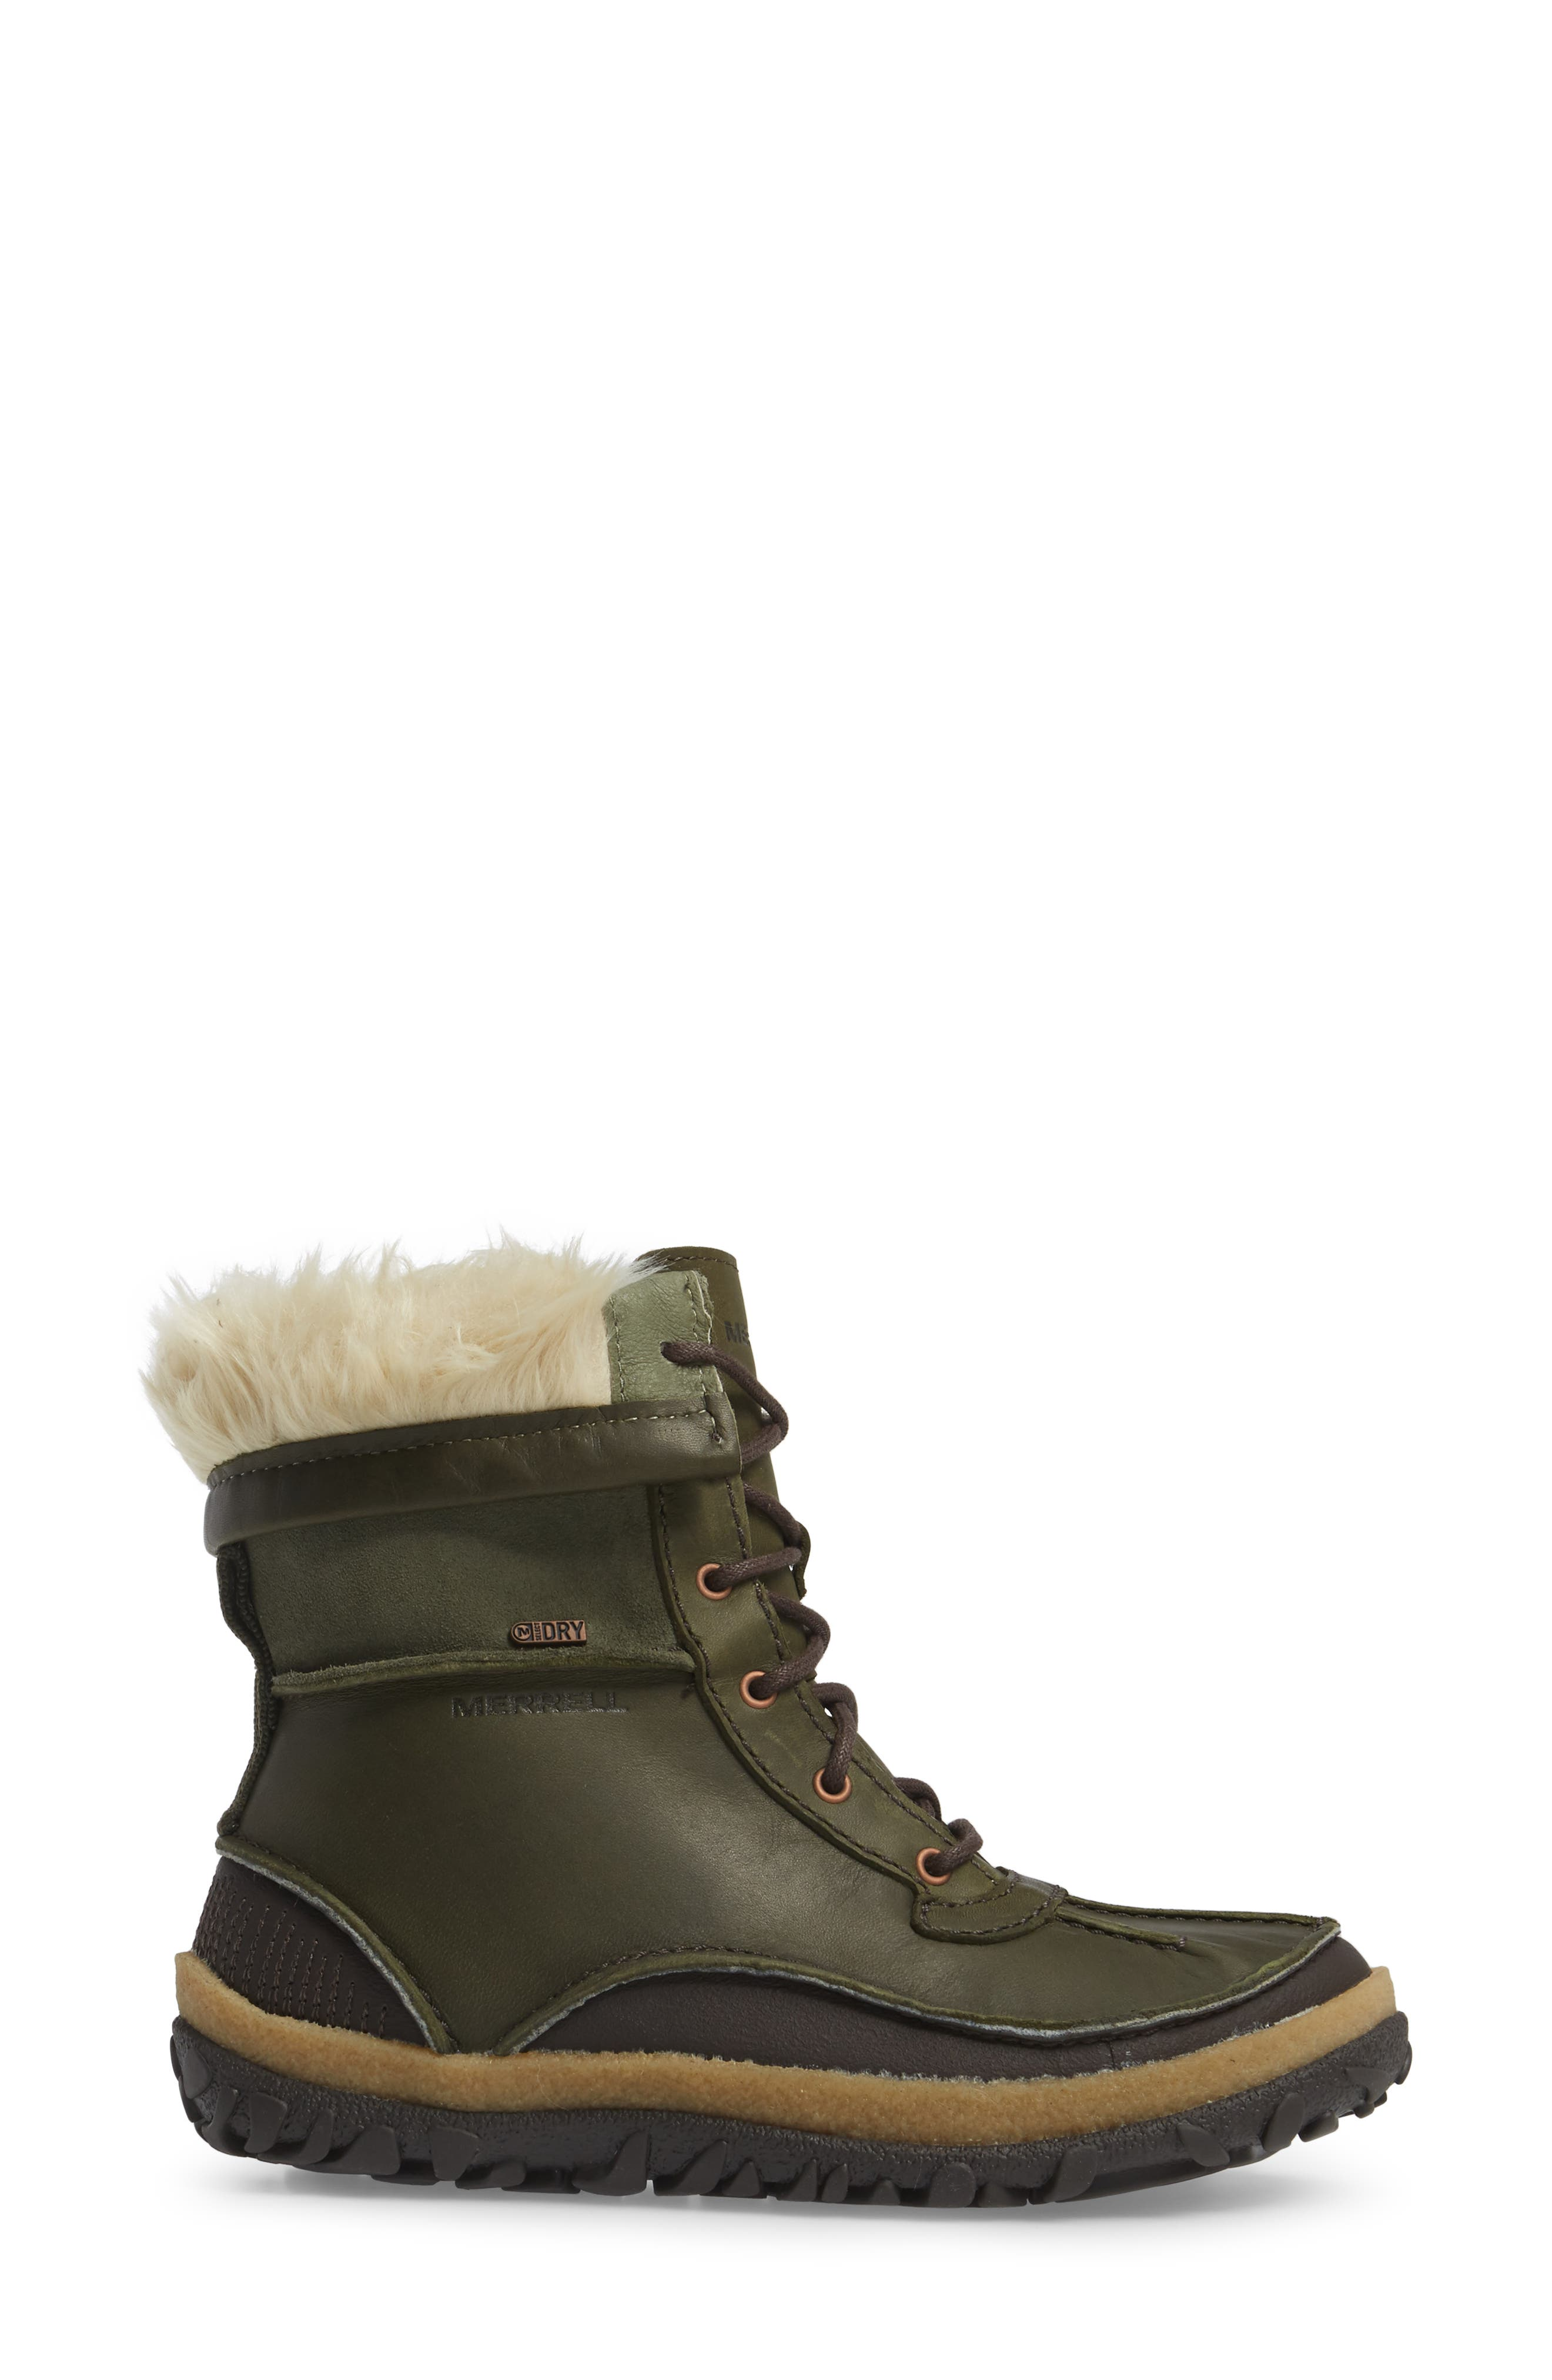 Alternate Image 3  - Merrell Tremblant Insulated Waterproof Boot (Women)